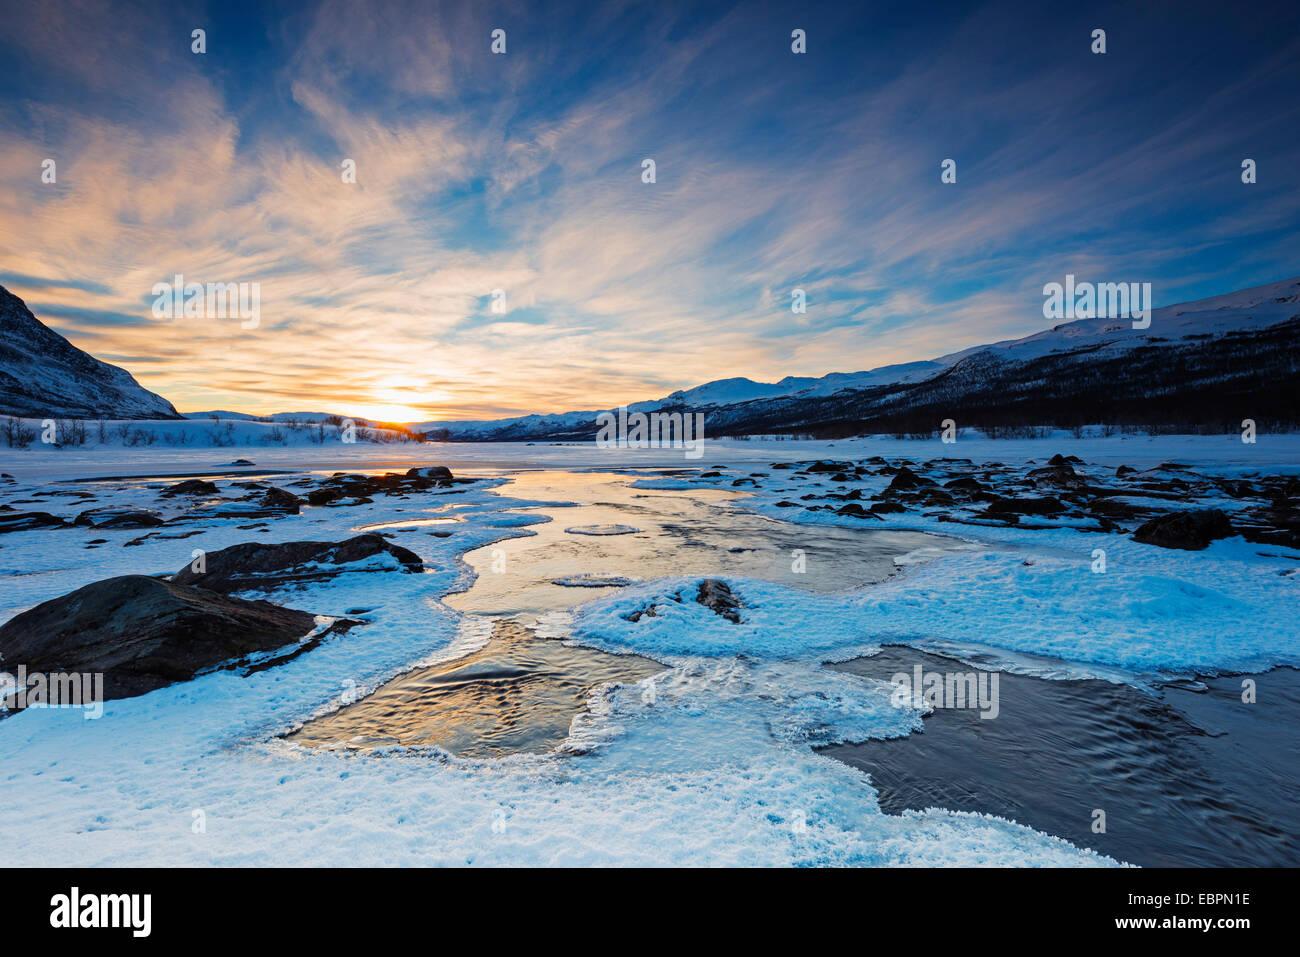 River, Abisko National Park, Helsinki, Finland, Scandinavia, Europe - Stock Image